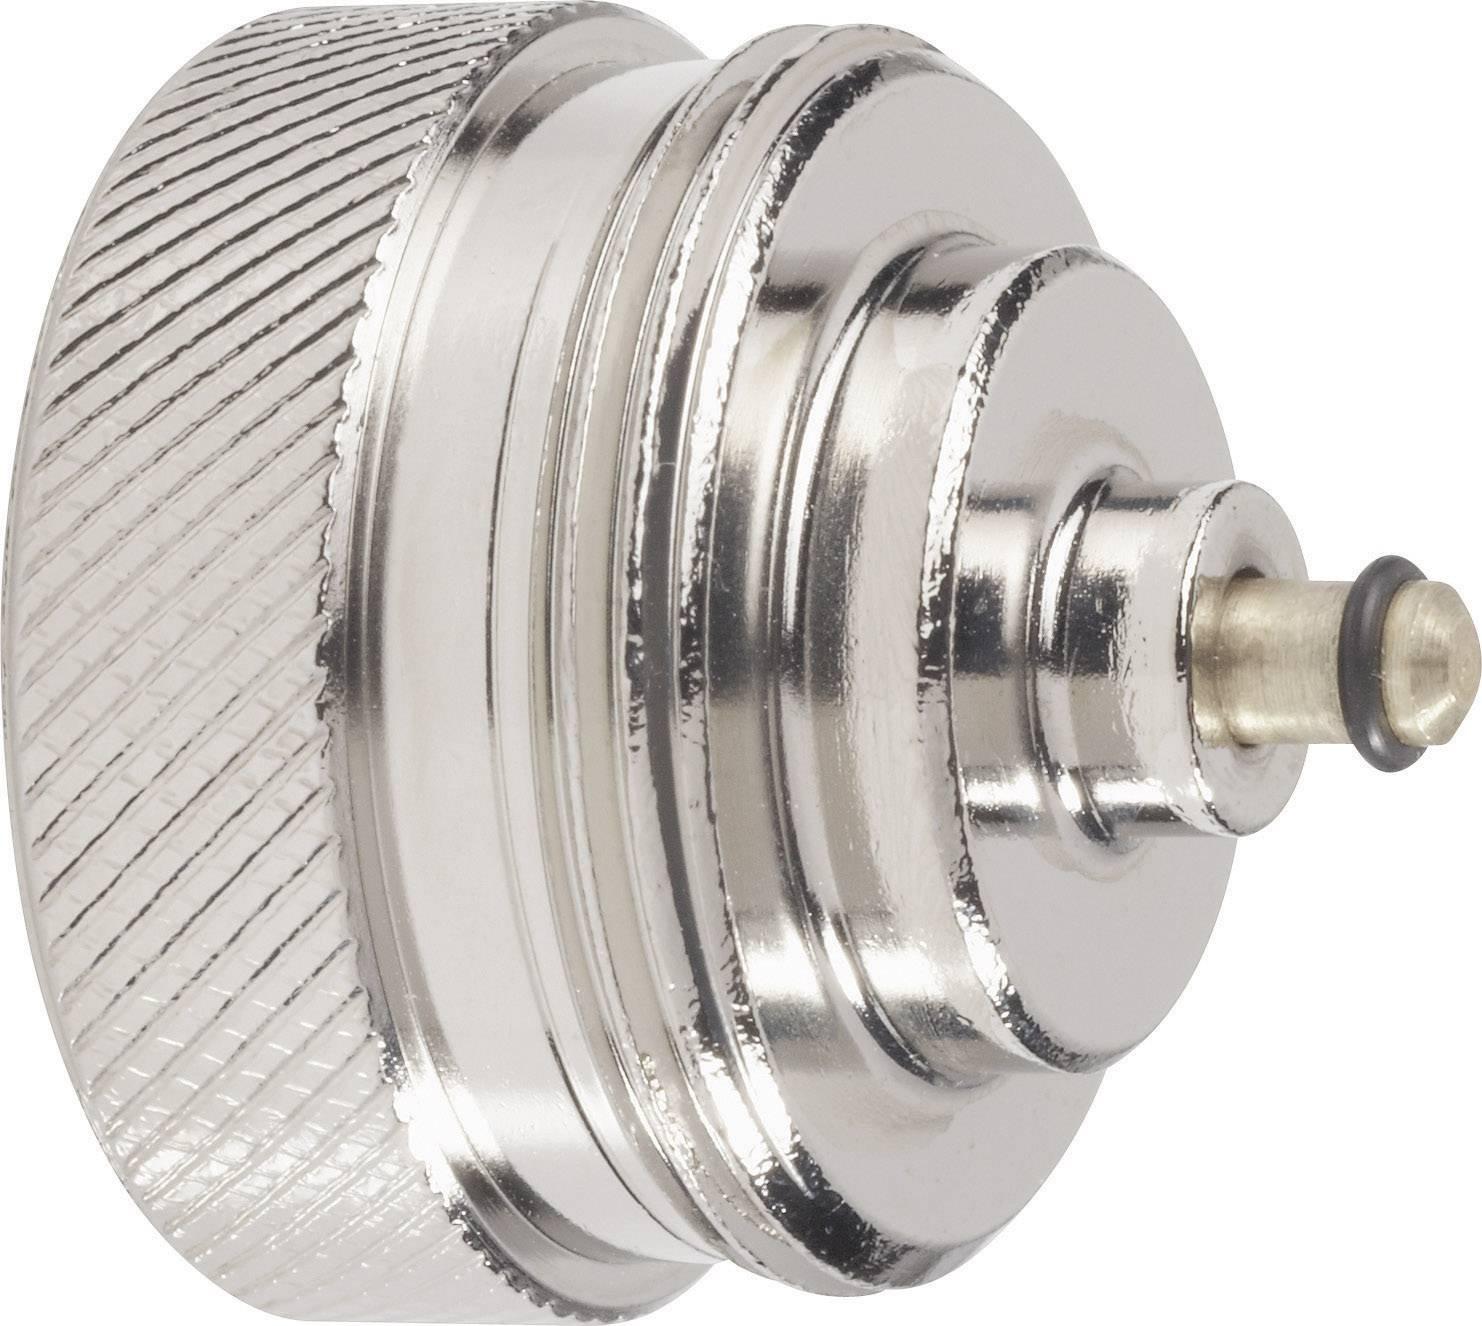 Mosadzný adaptér termostatu 700 100 010 vhodný pre Markaryd, M28 x 1.5